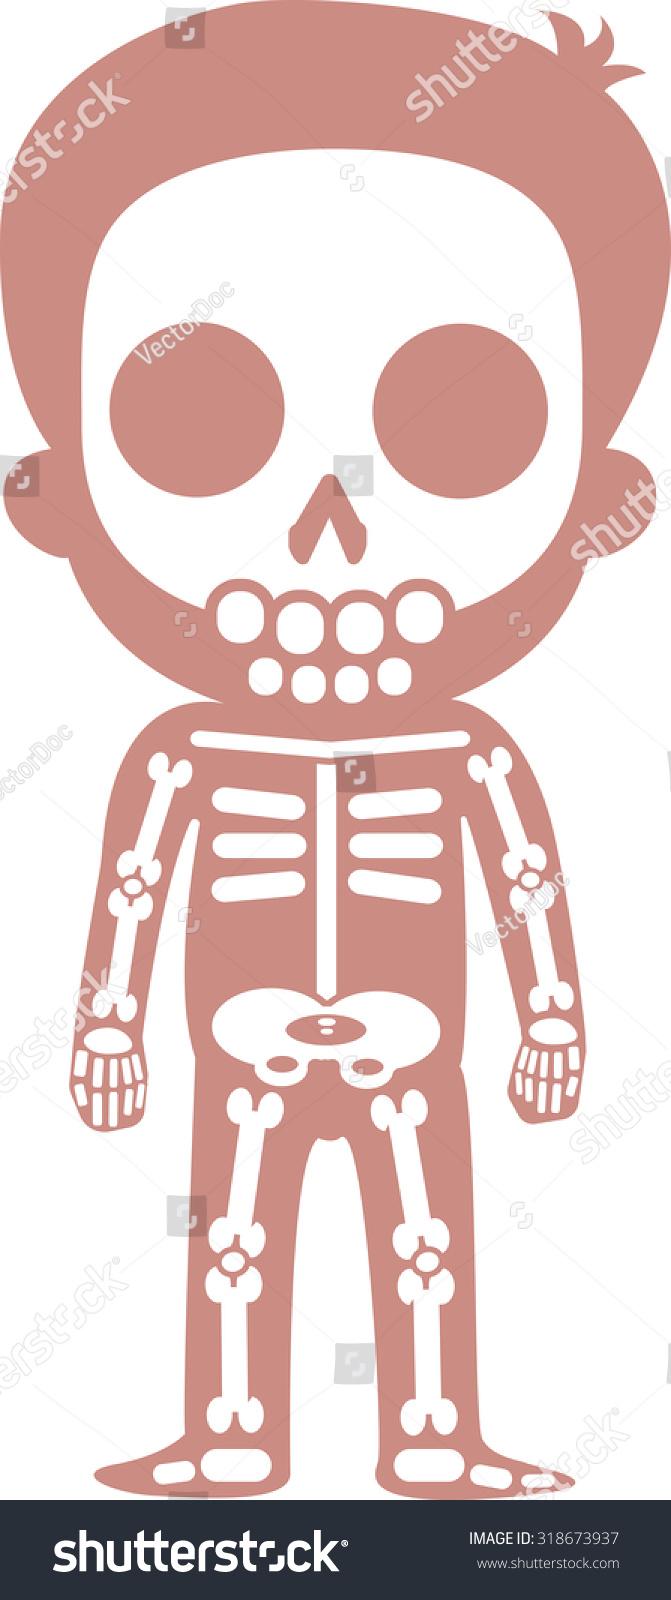 Educational Anatomy Body Organ Chart Kids Stock Vector Royalty Free